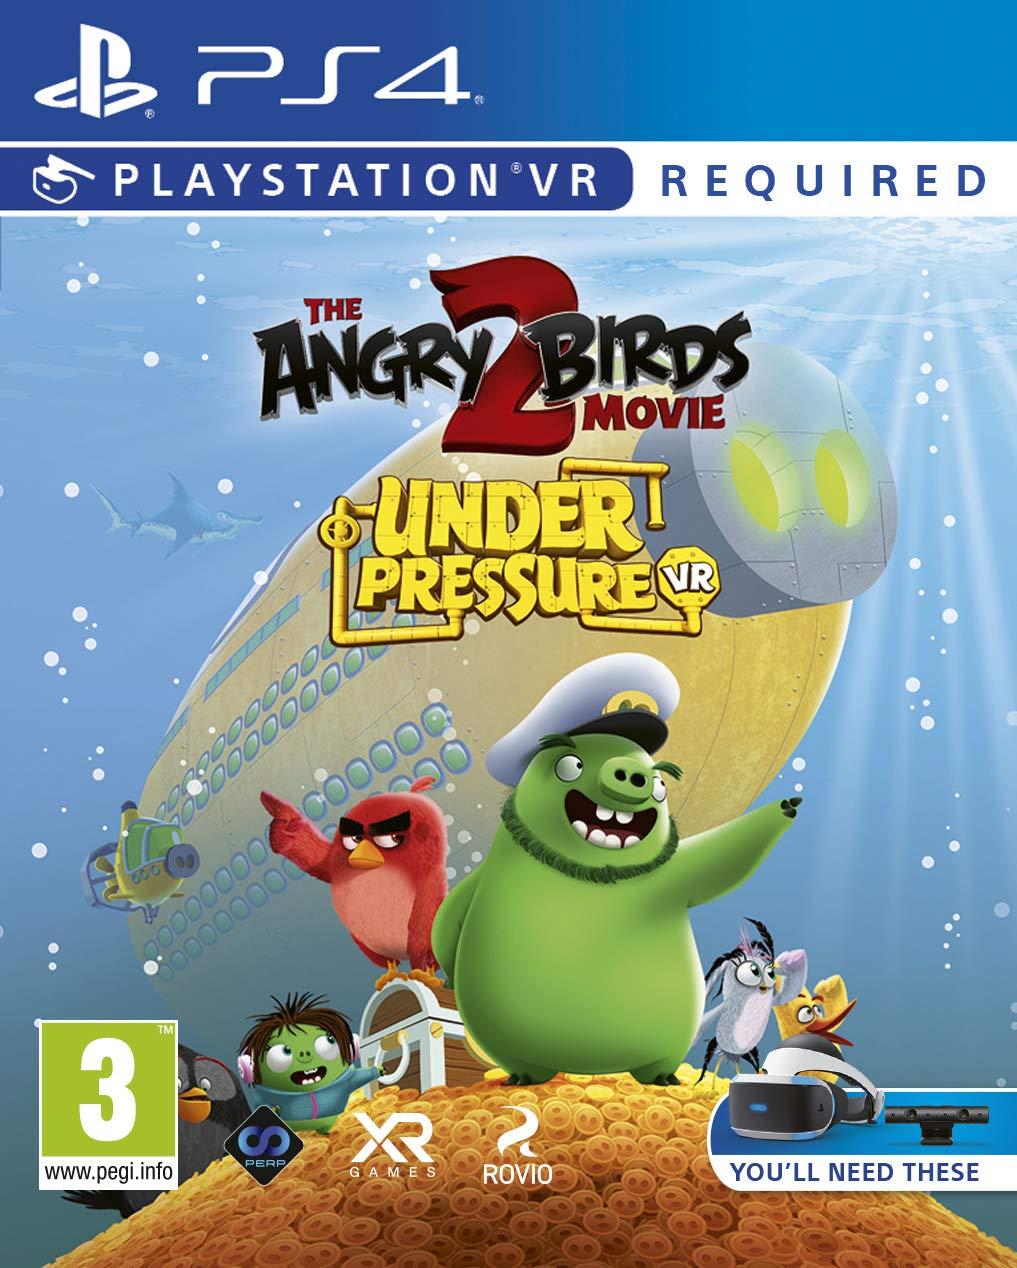 The Angry Birds Movie 2 VR: Under Pressure (PSVR / PS4) £14.99 (Prime) / £17.98 (Non-Prime) Delivered @ Amazon